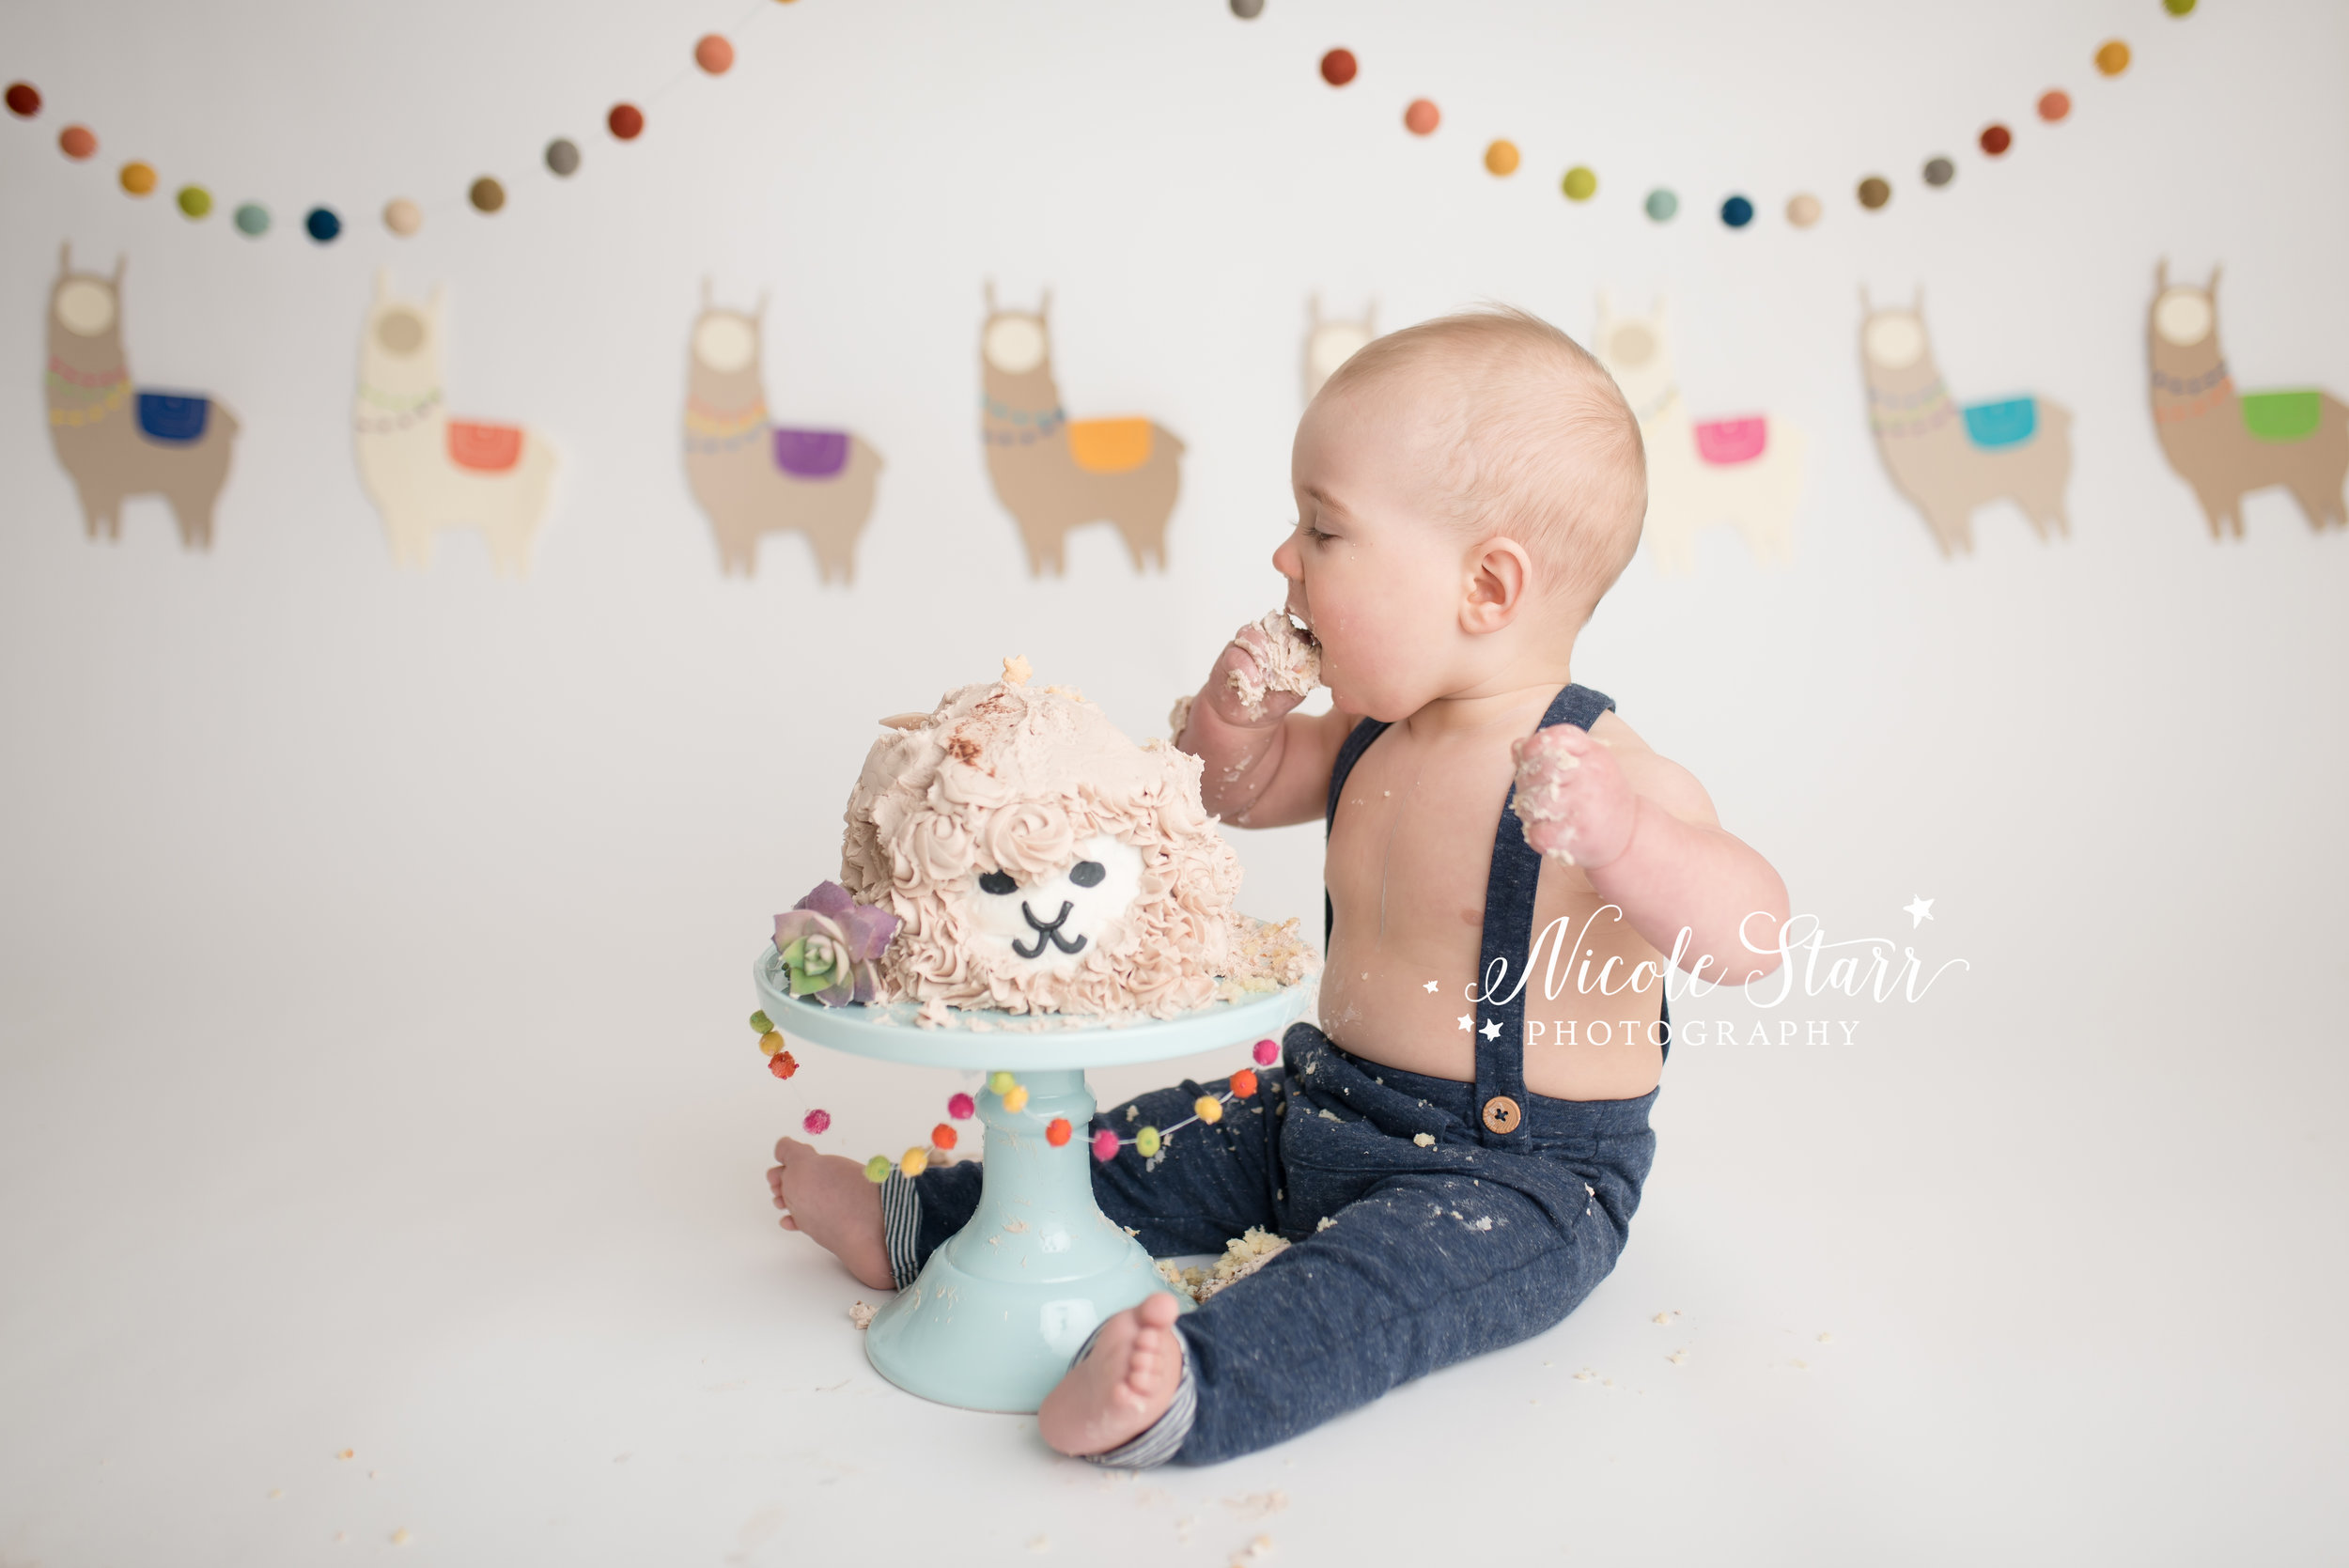 llama cake smash, nicole starr photography, saratoga springs cake smash photographer-8.jpg